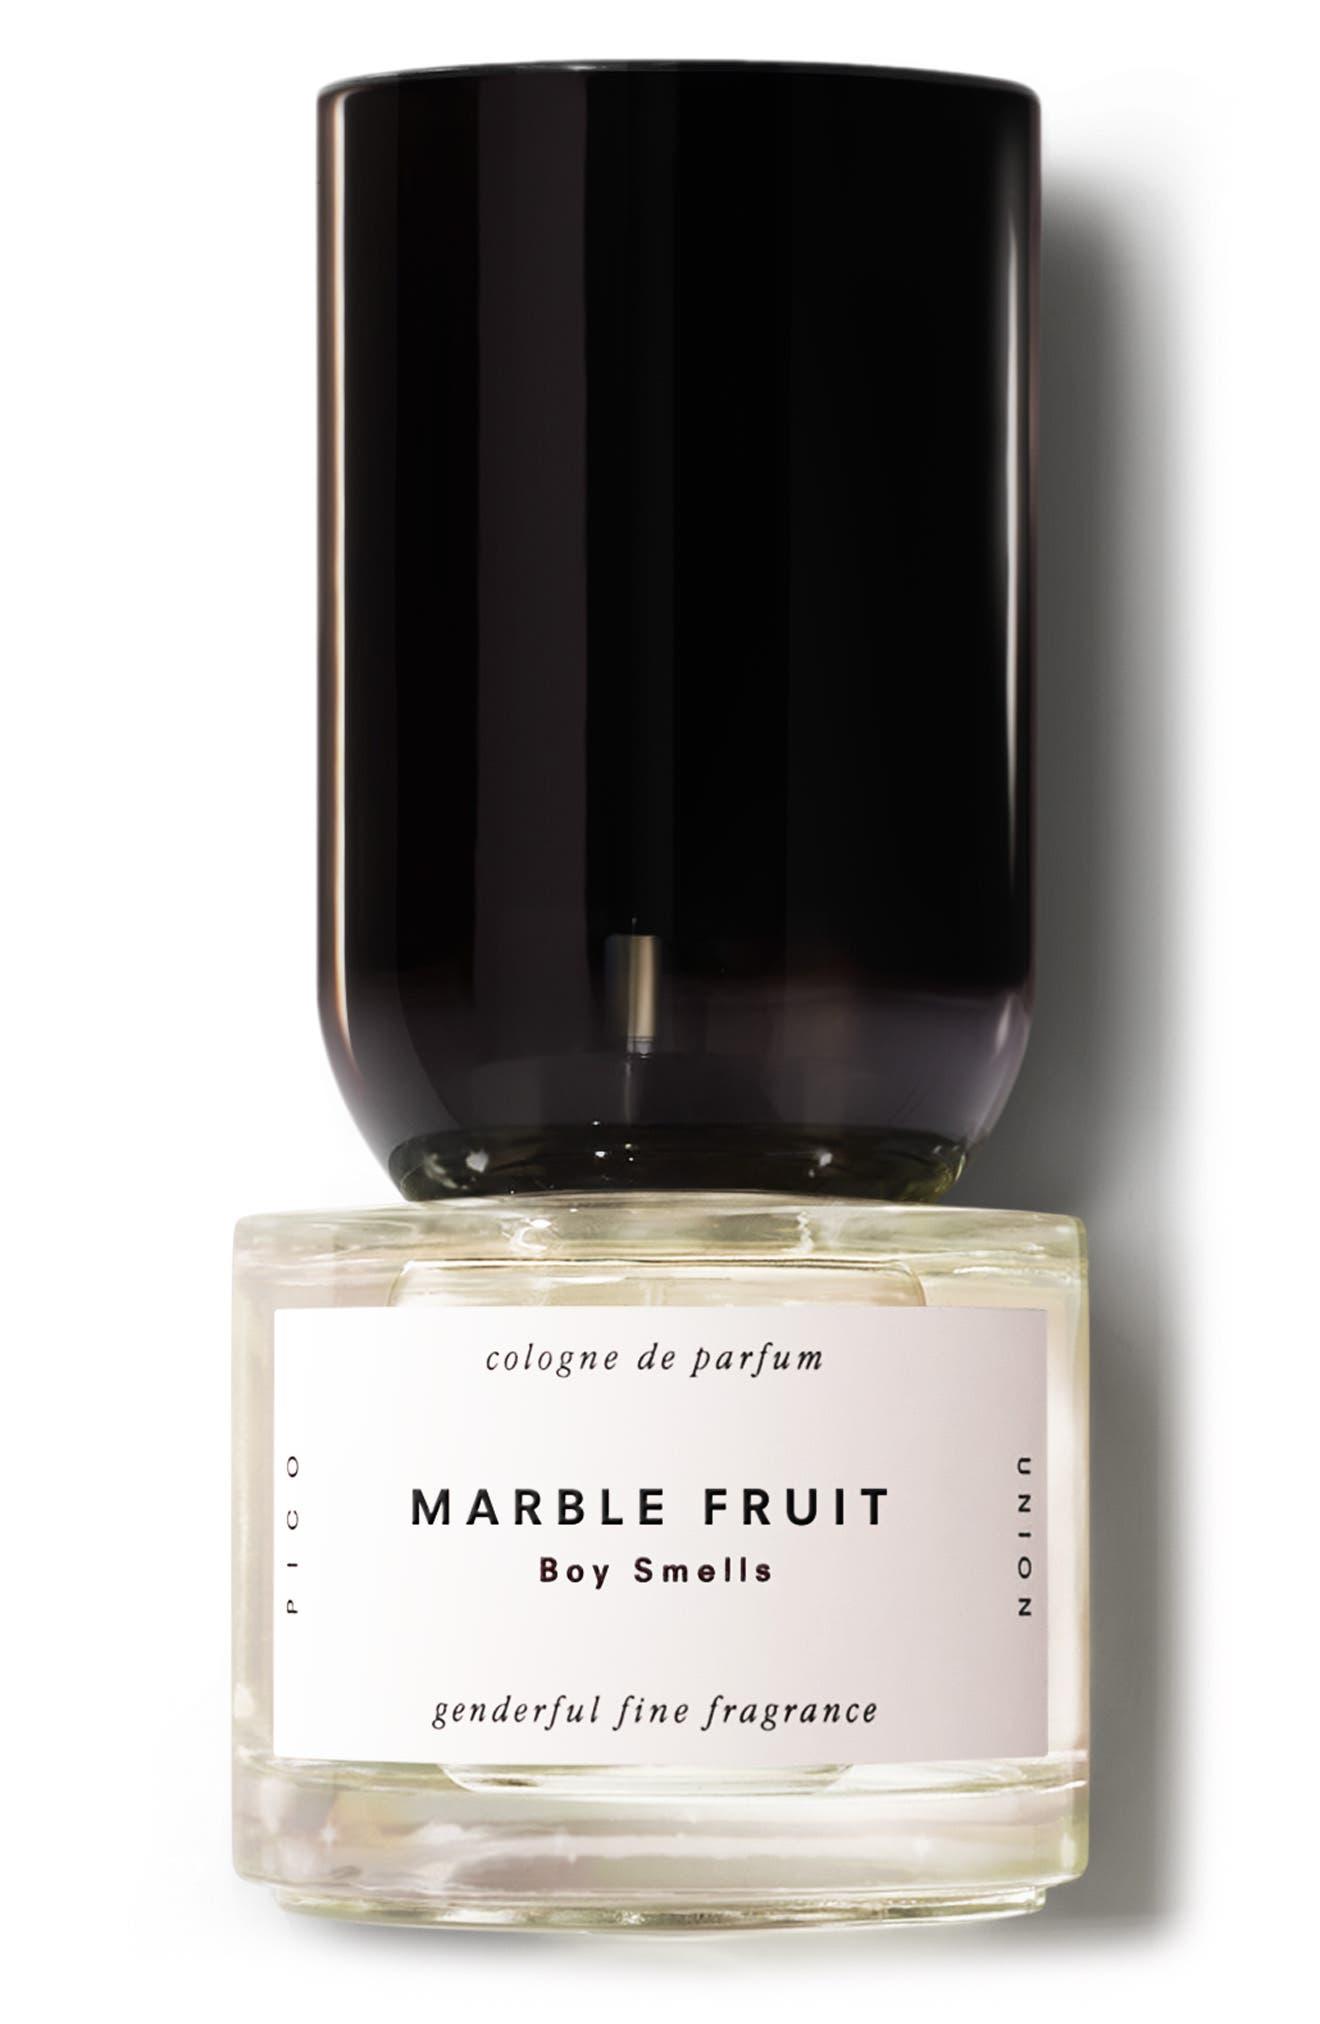 Marble Fruit Genderful Fine Fragrance (Limited Edition)